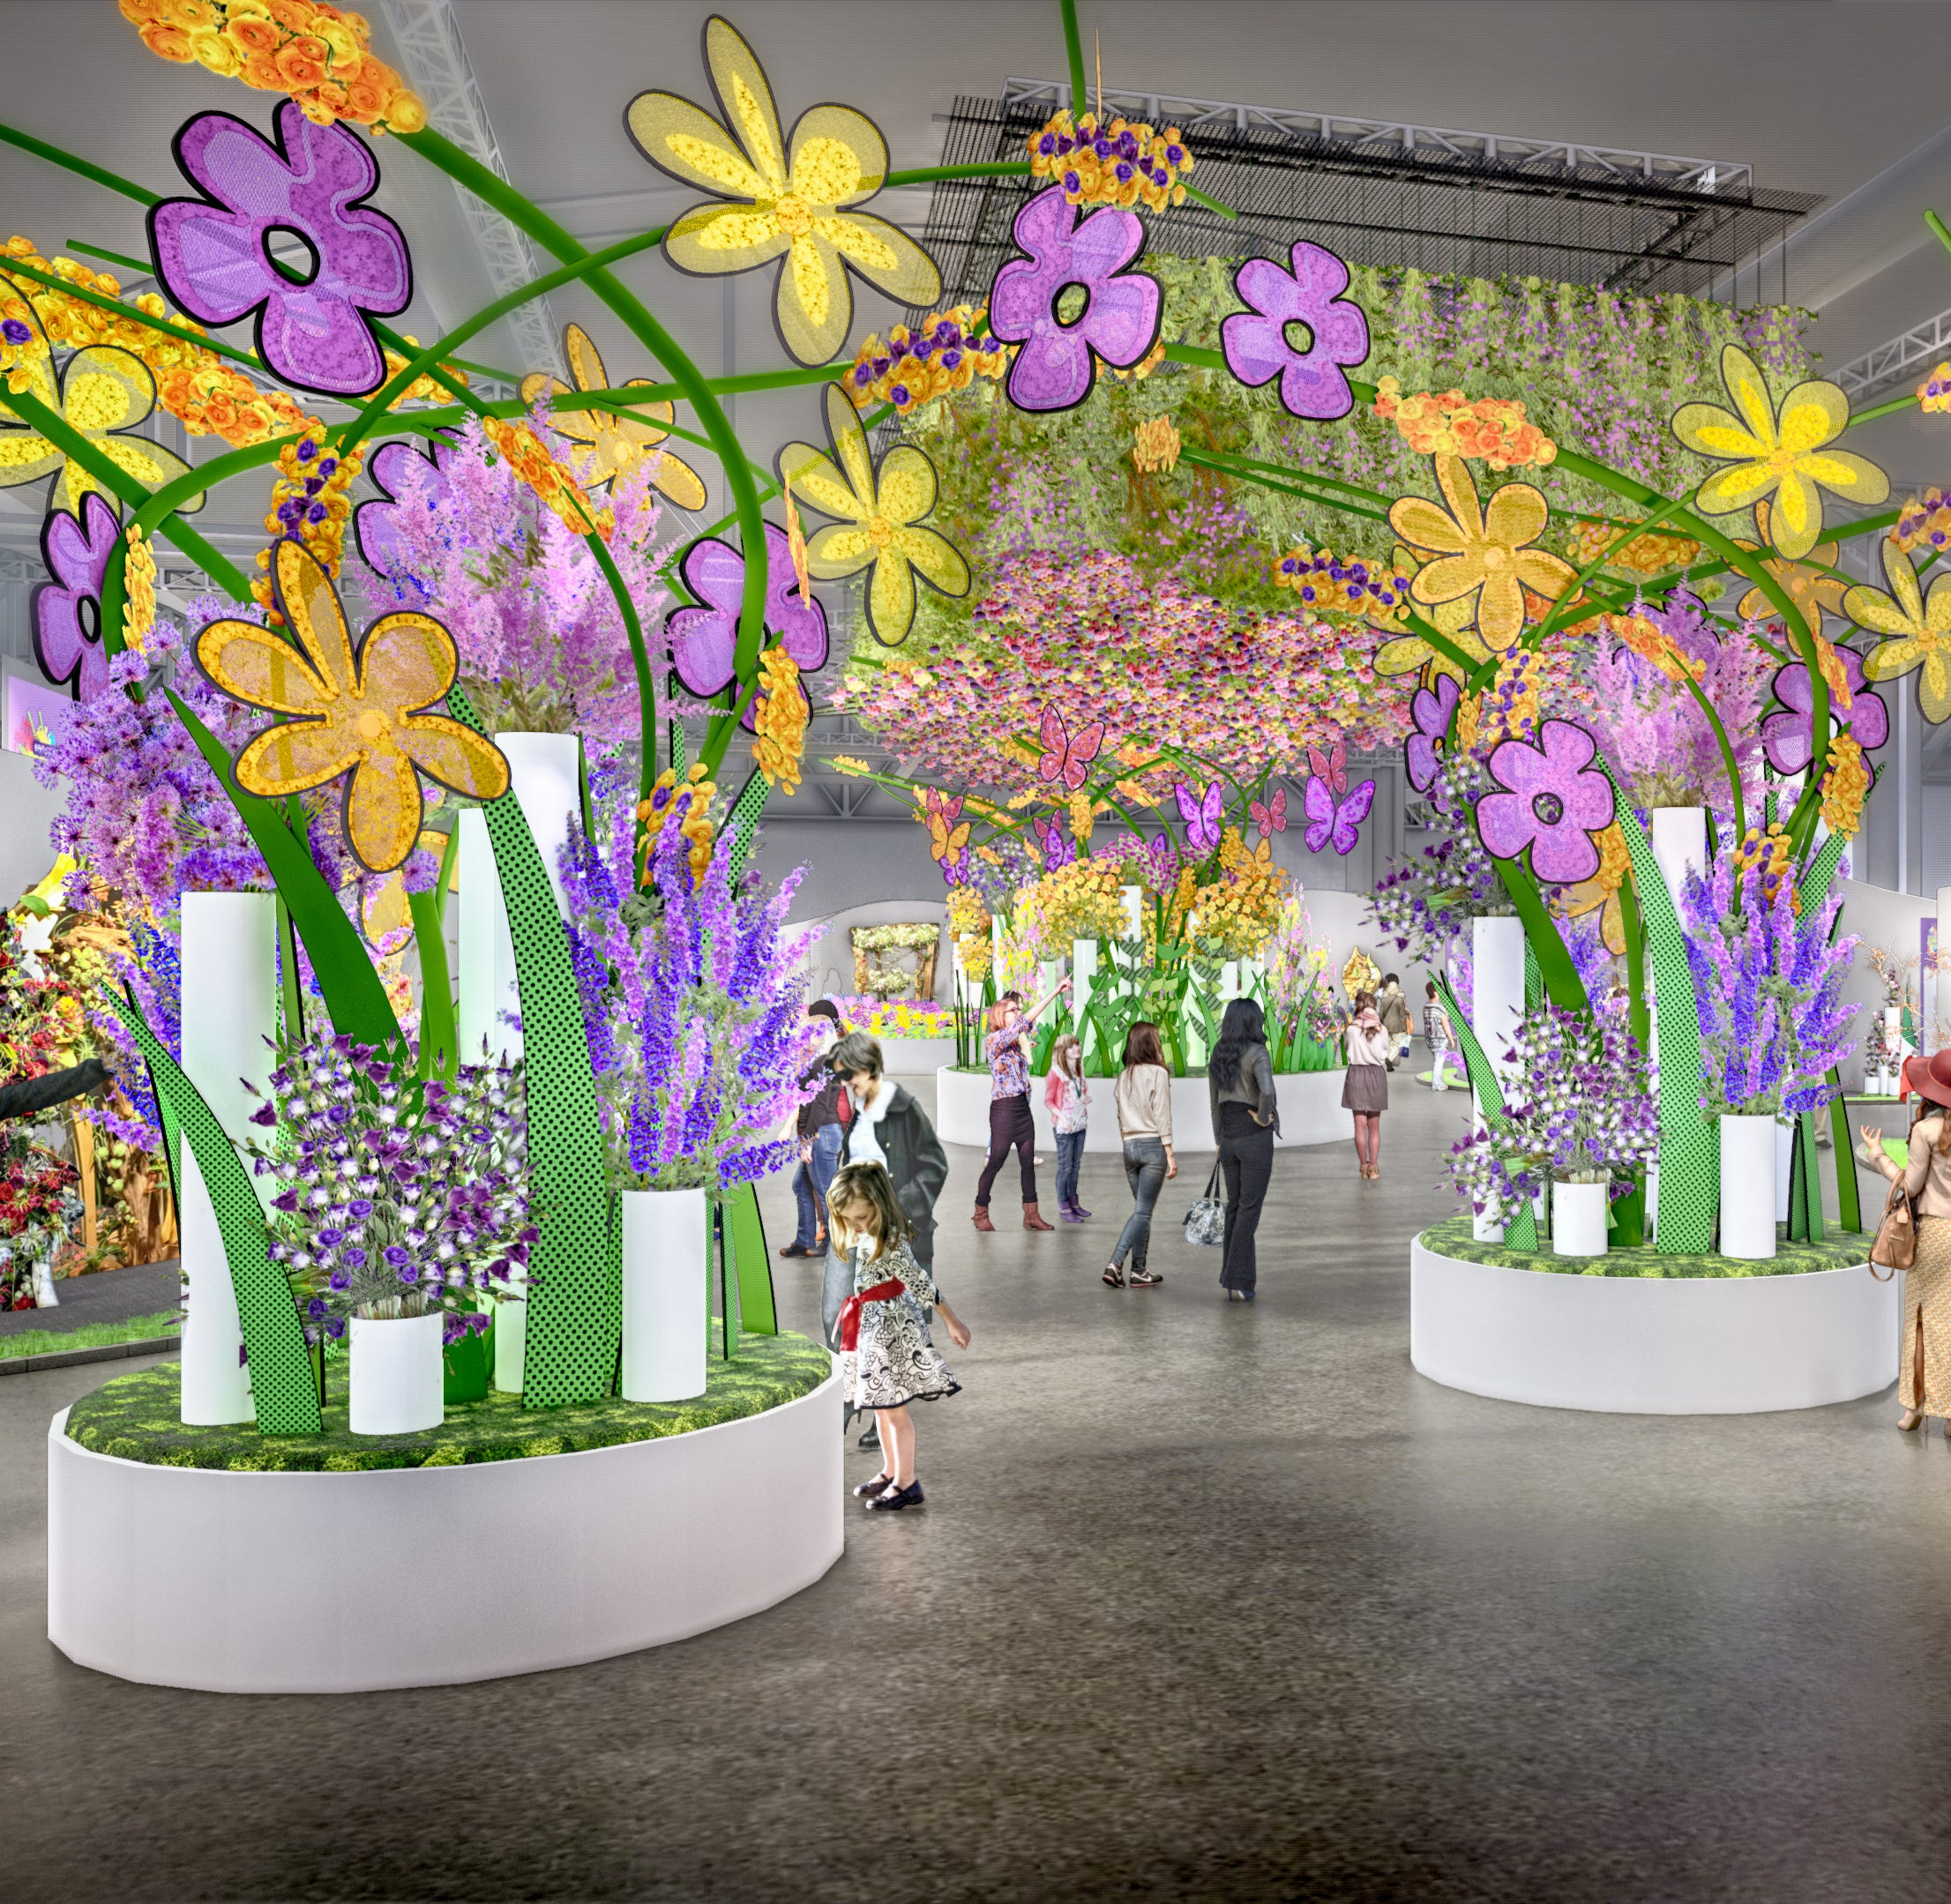 Pop art, Woodstock era energize 2019 Philadelphia Flower Show